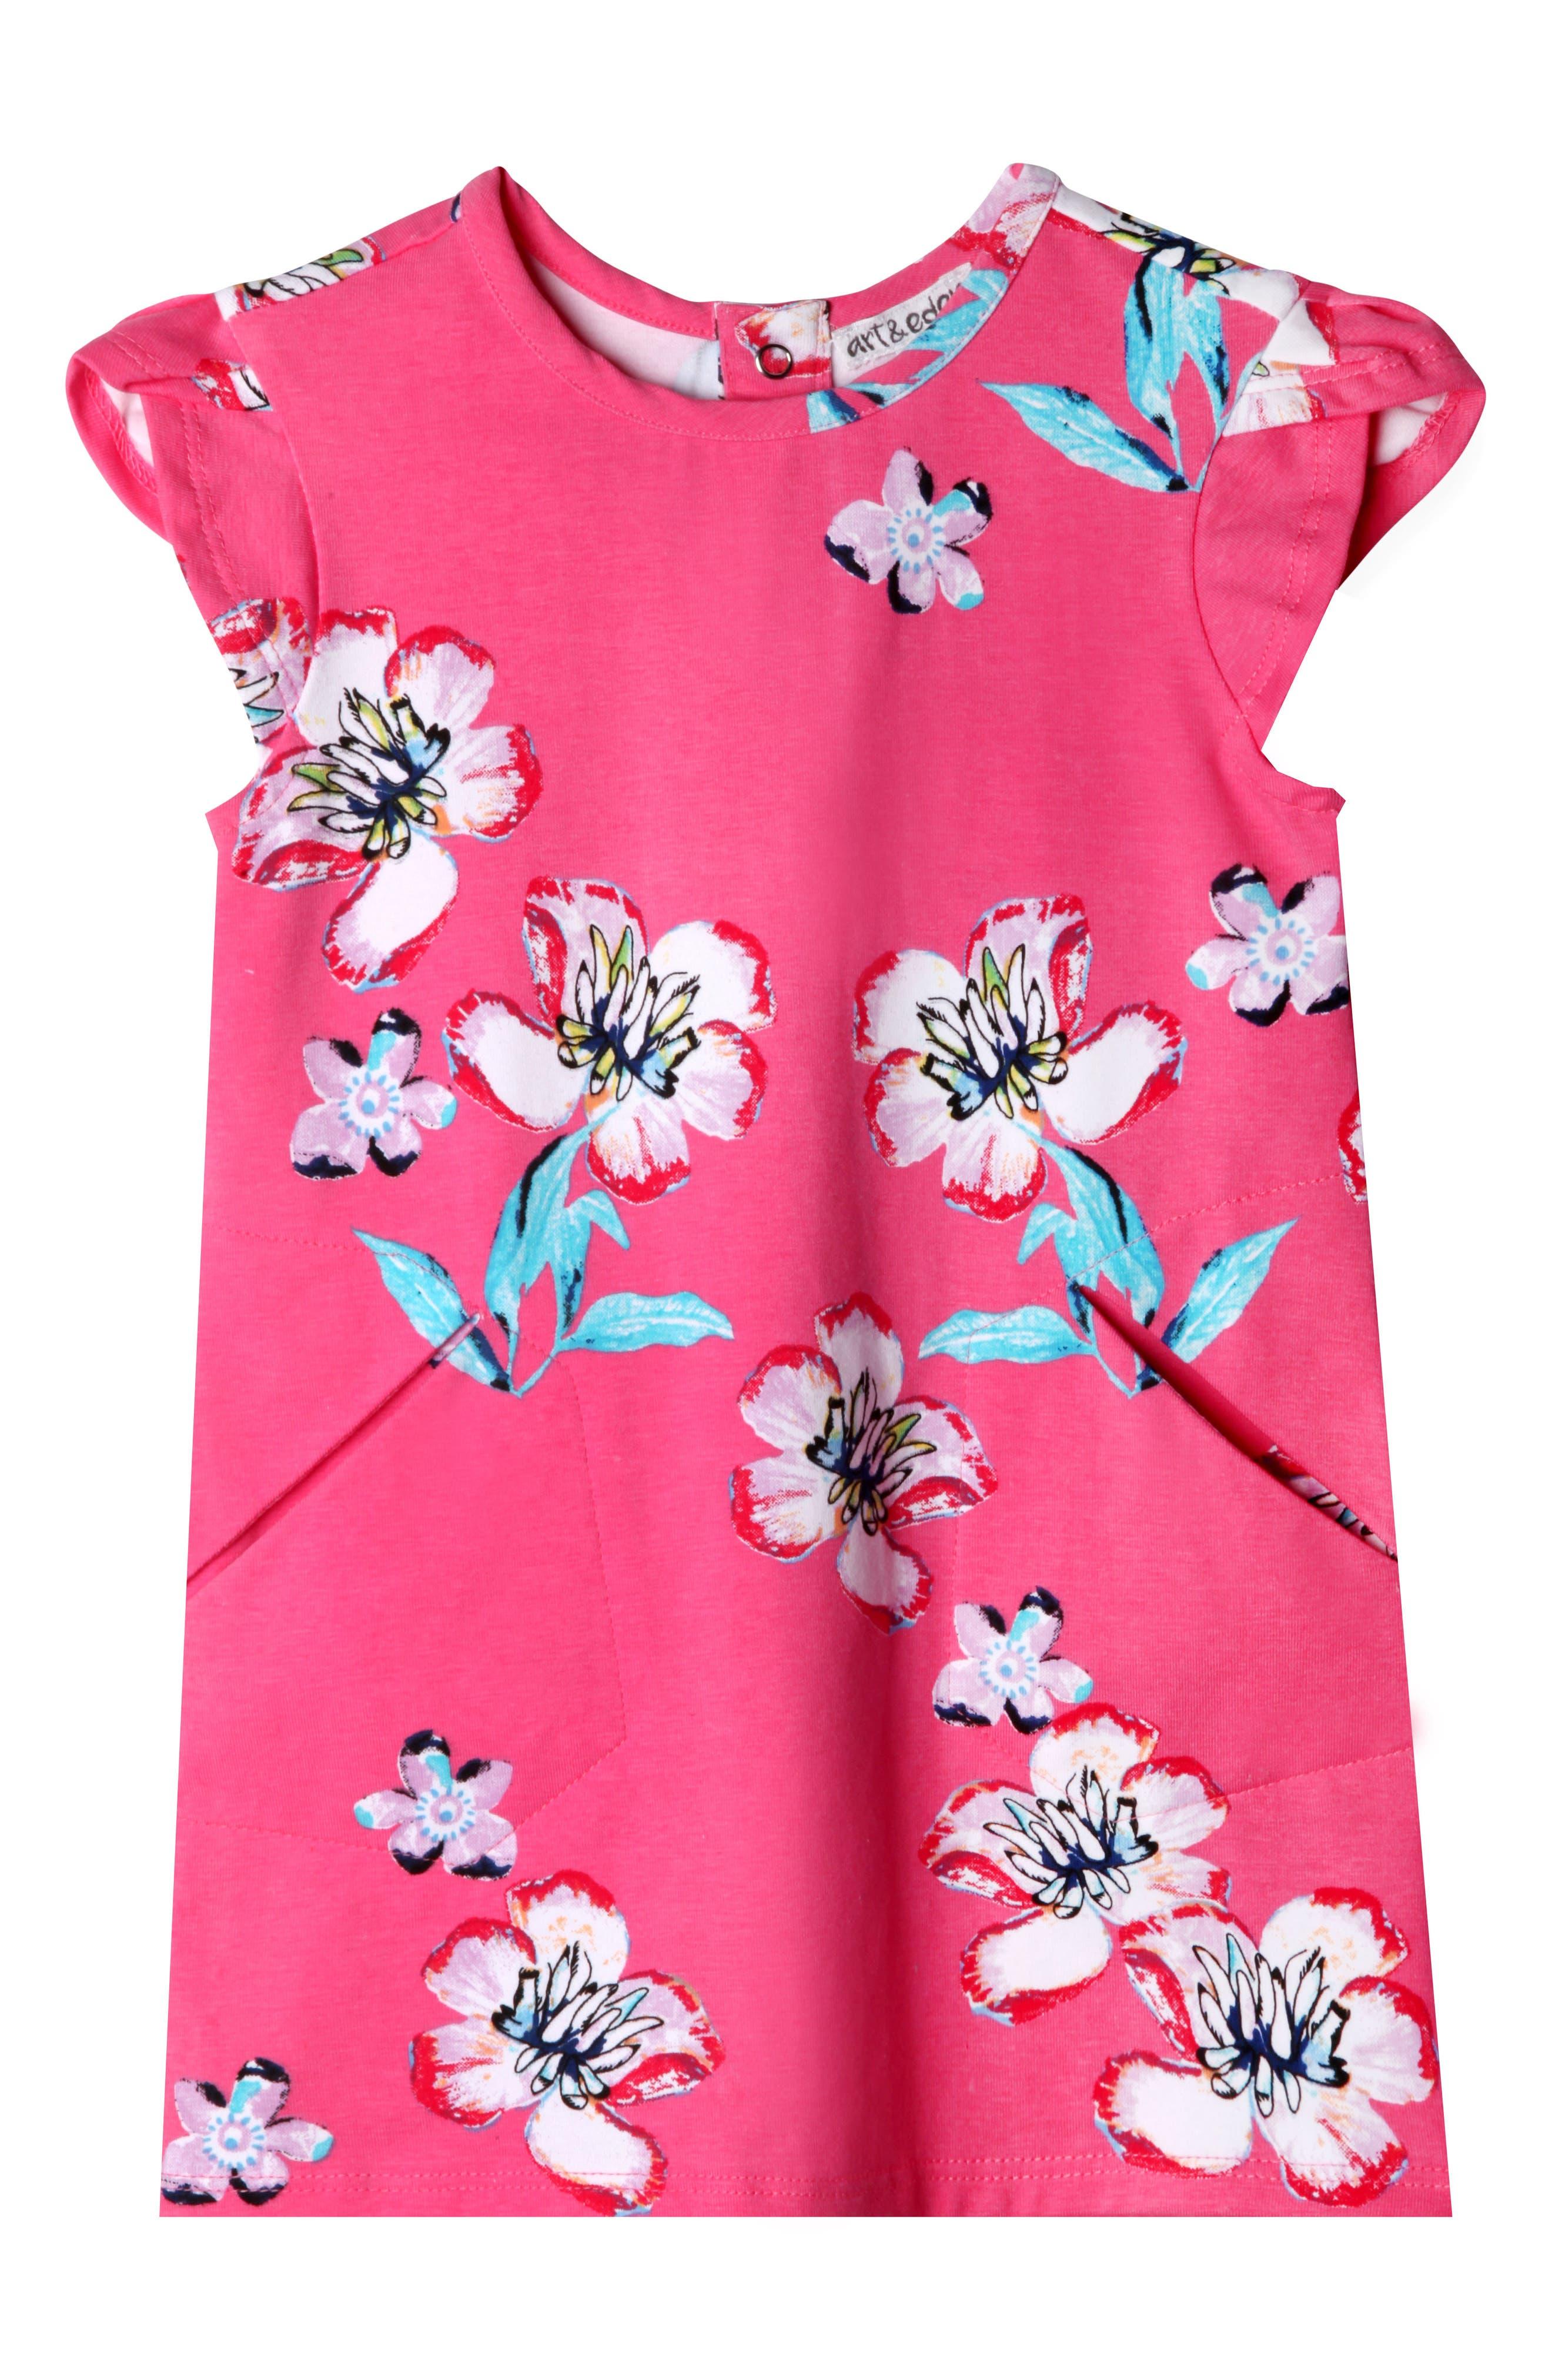 Ivy Plumeria Dress,                             Main thumbnail 1, color,                             PINK PLUMERIA